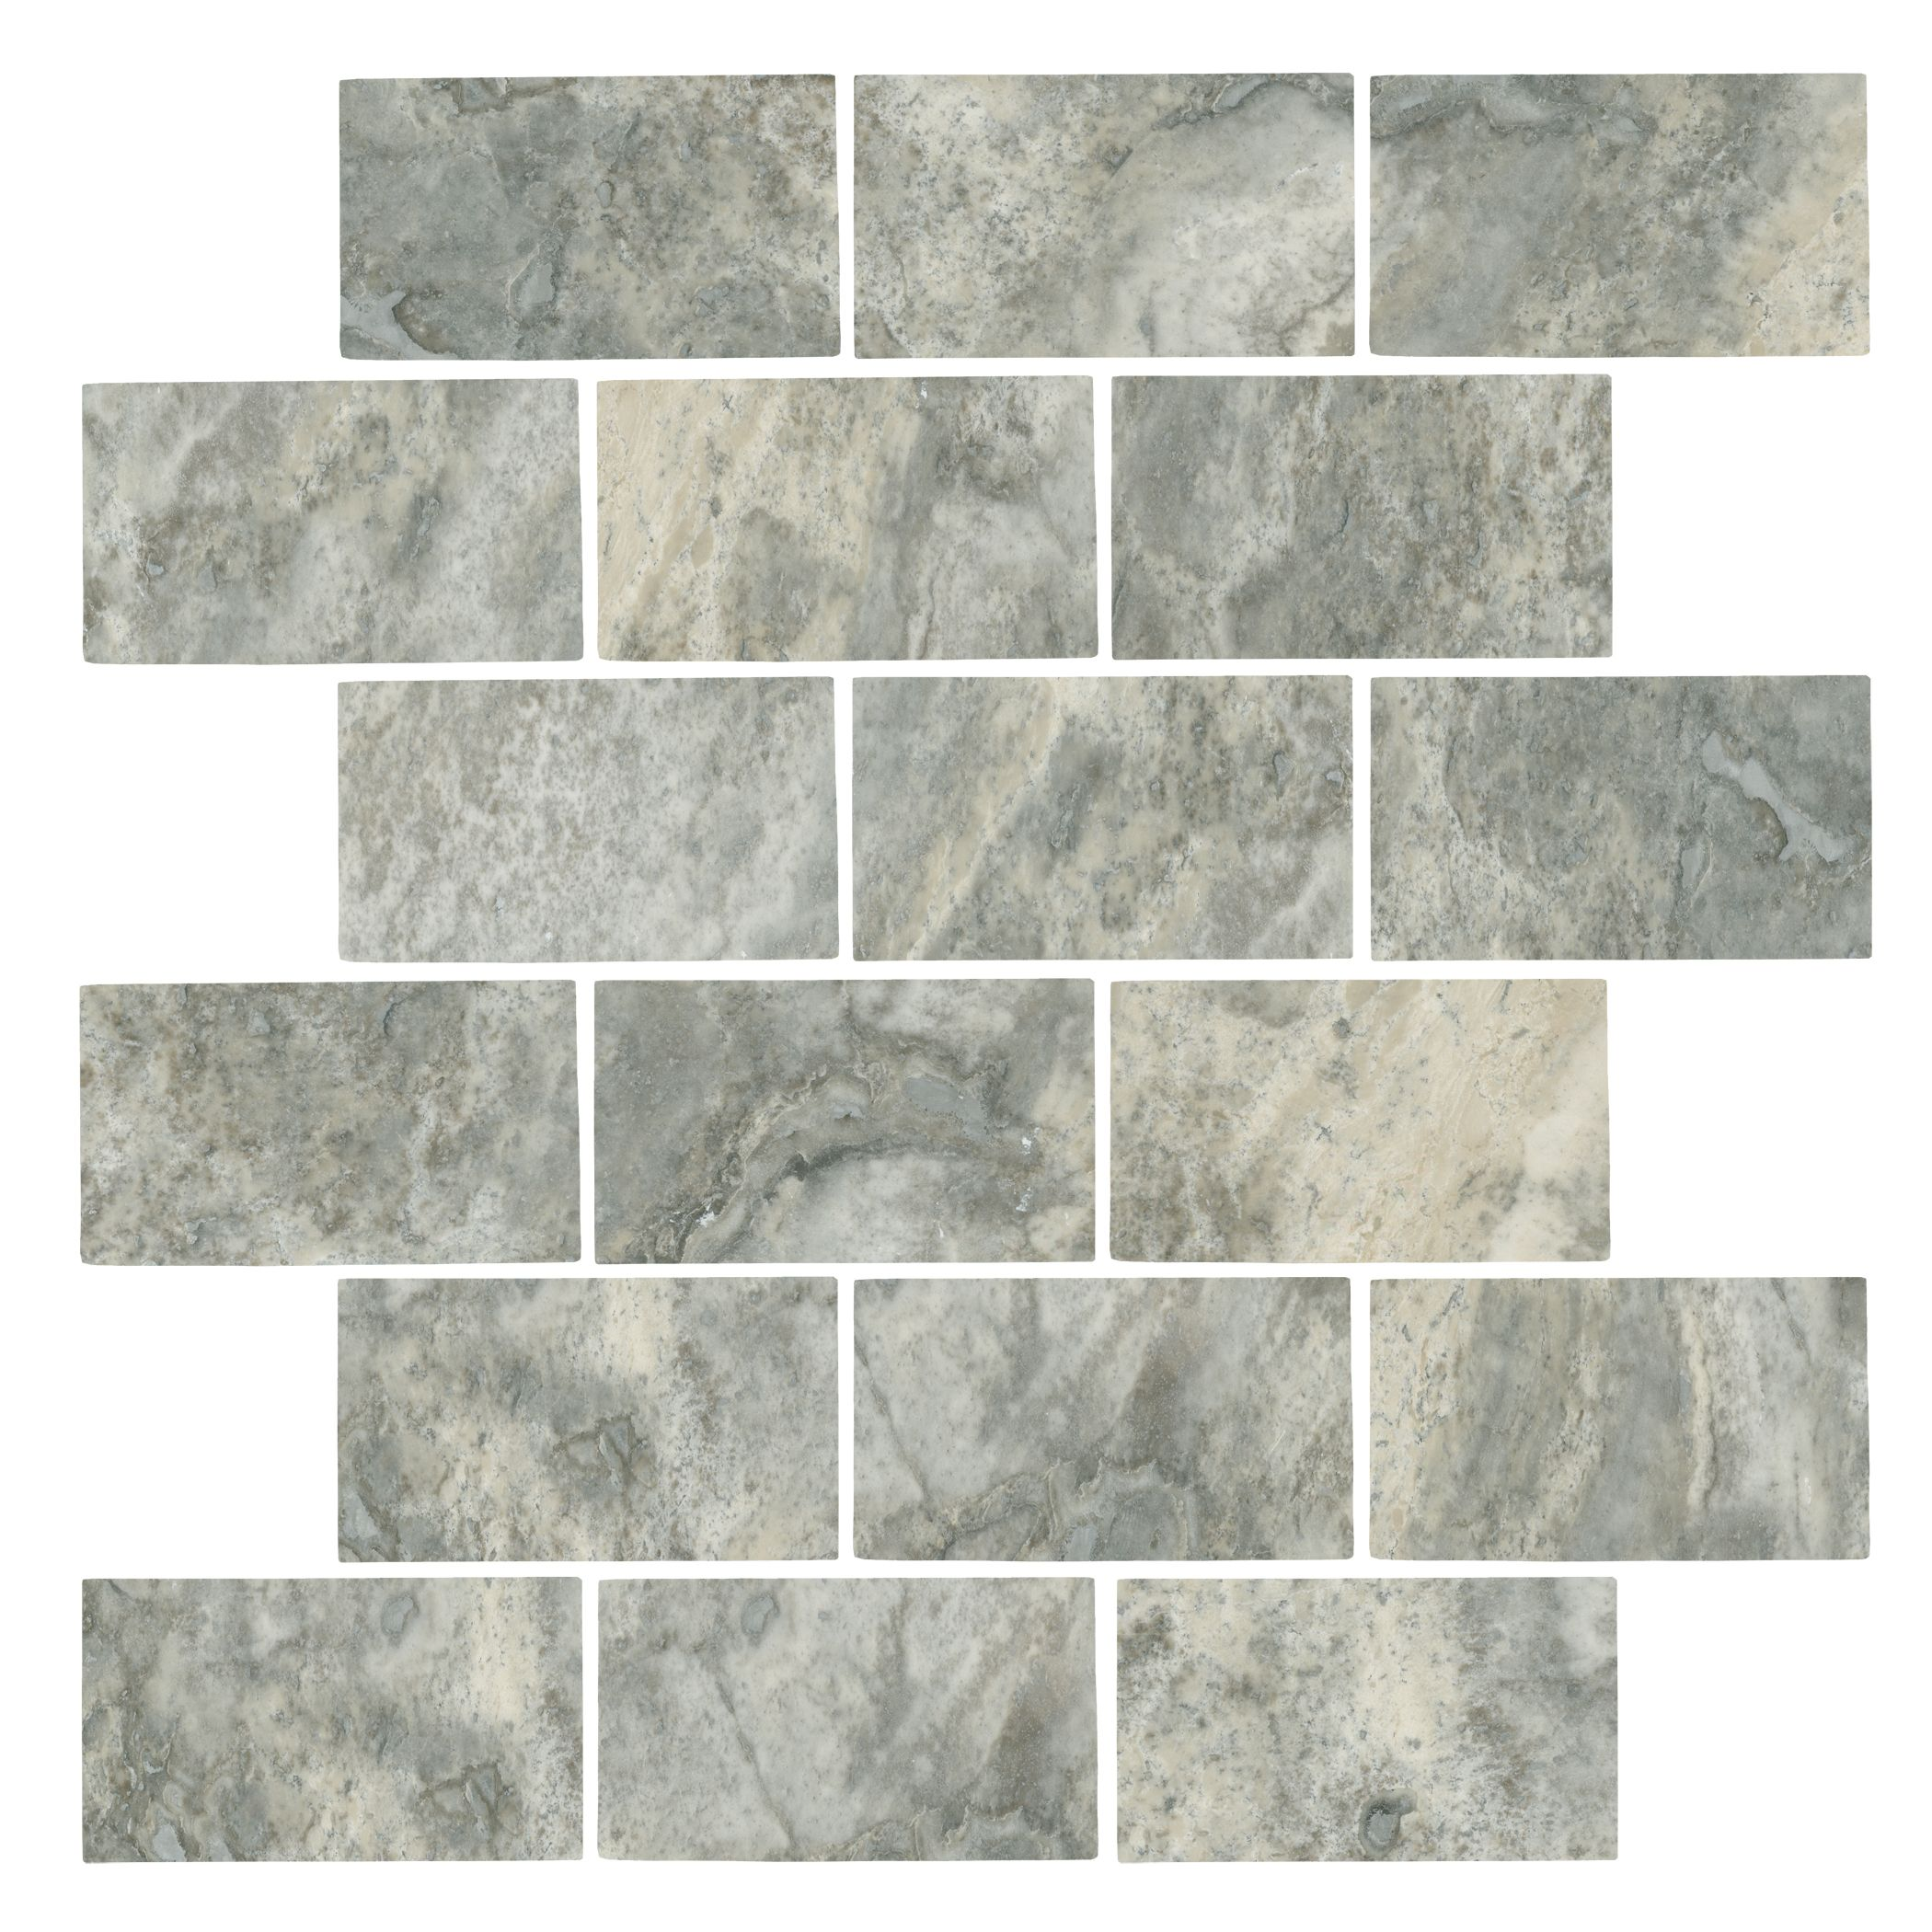 - Claros Silver Honed Amalfi 12 X 12 - Backsplash Tile Floor, The Tile  Shop, Travertine Mosaic Tiles